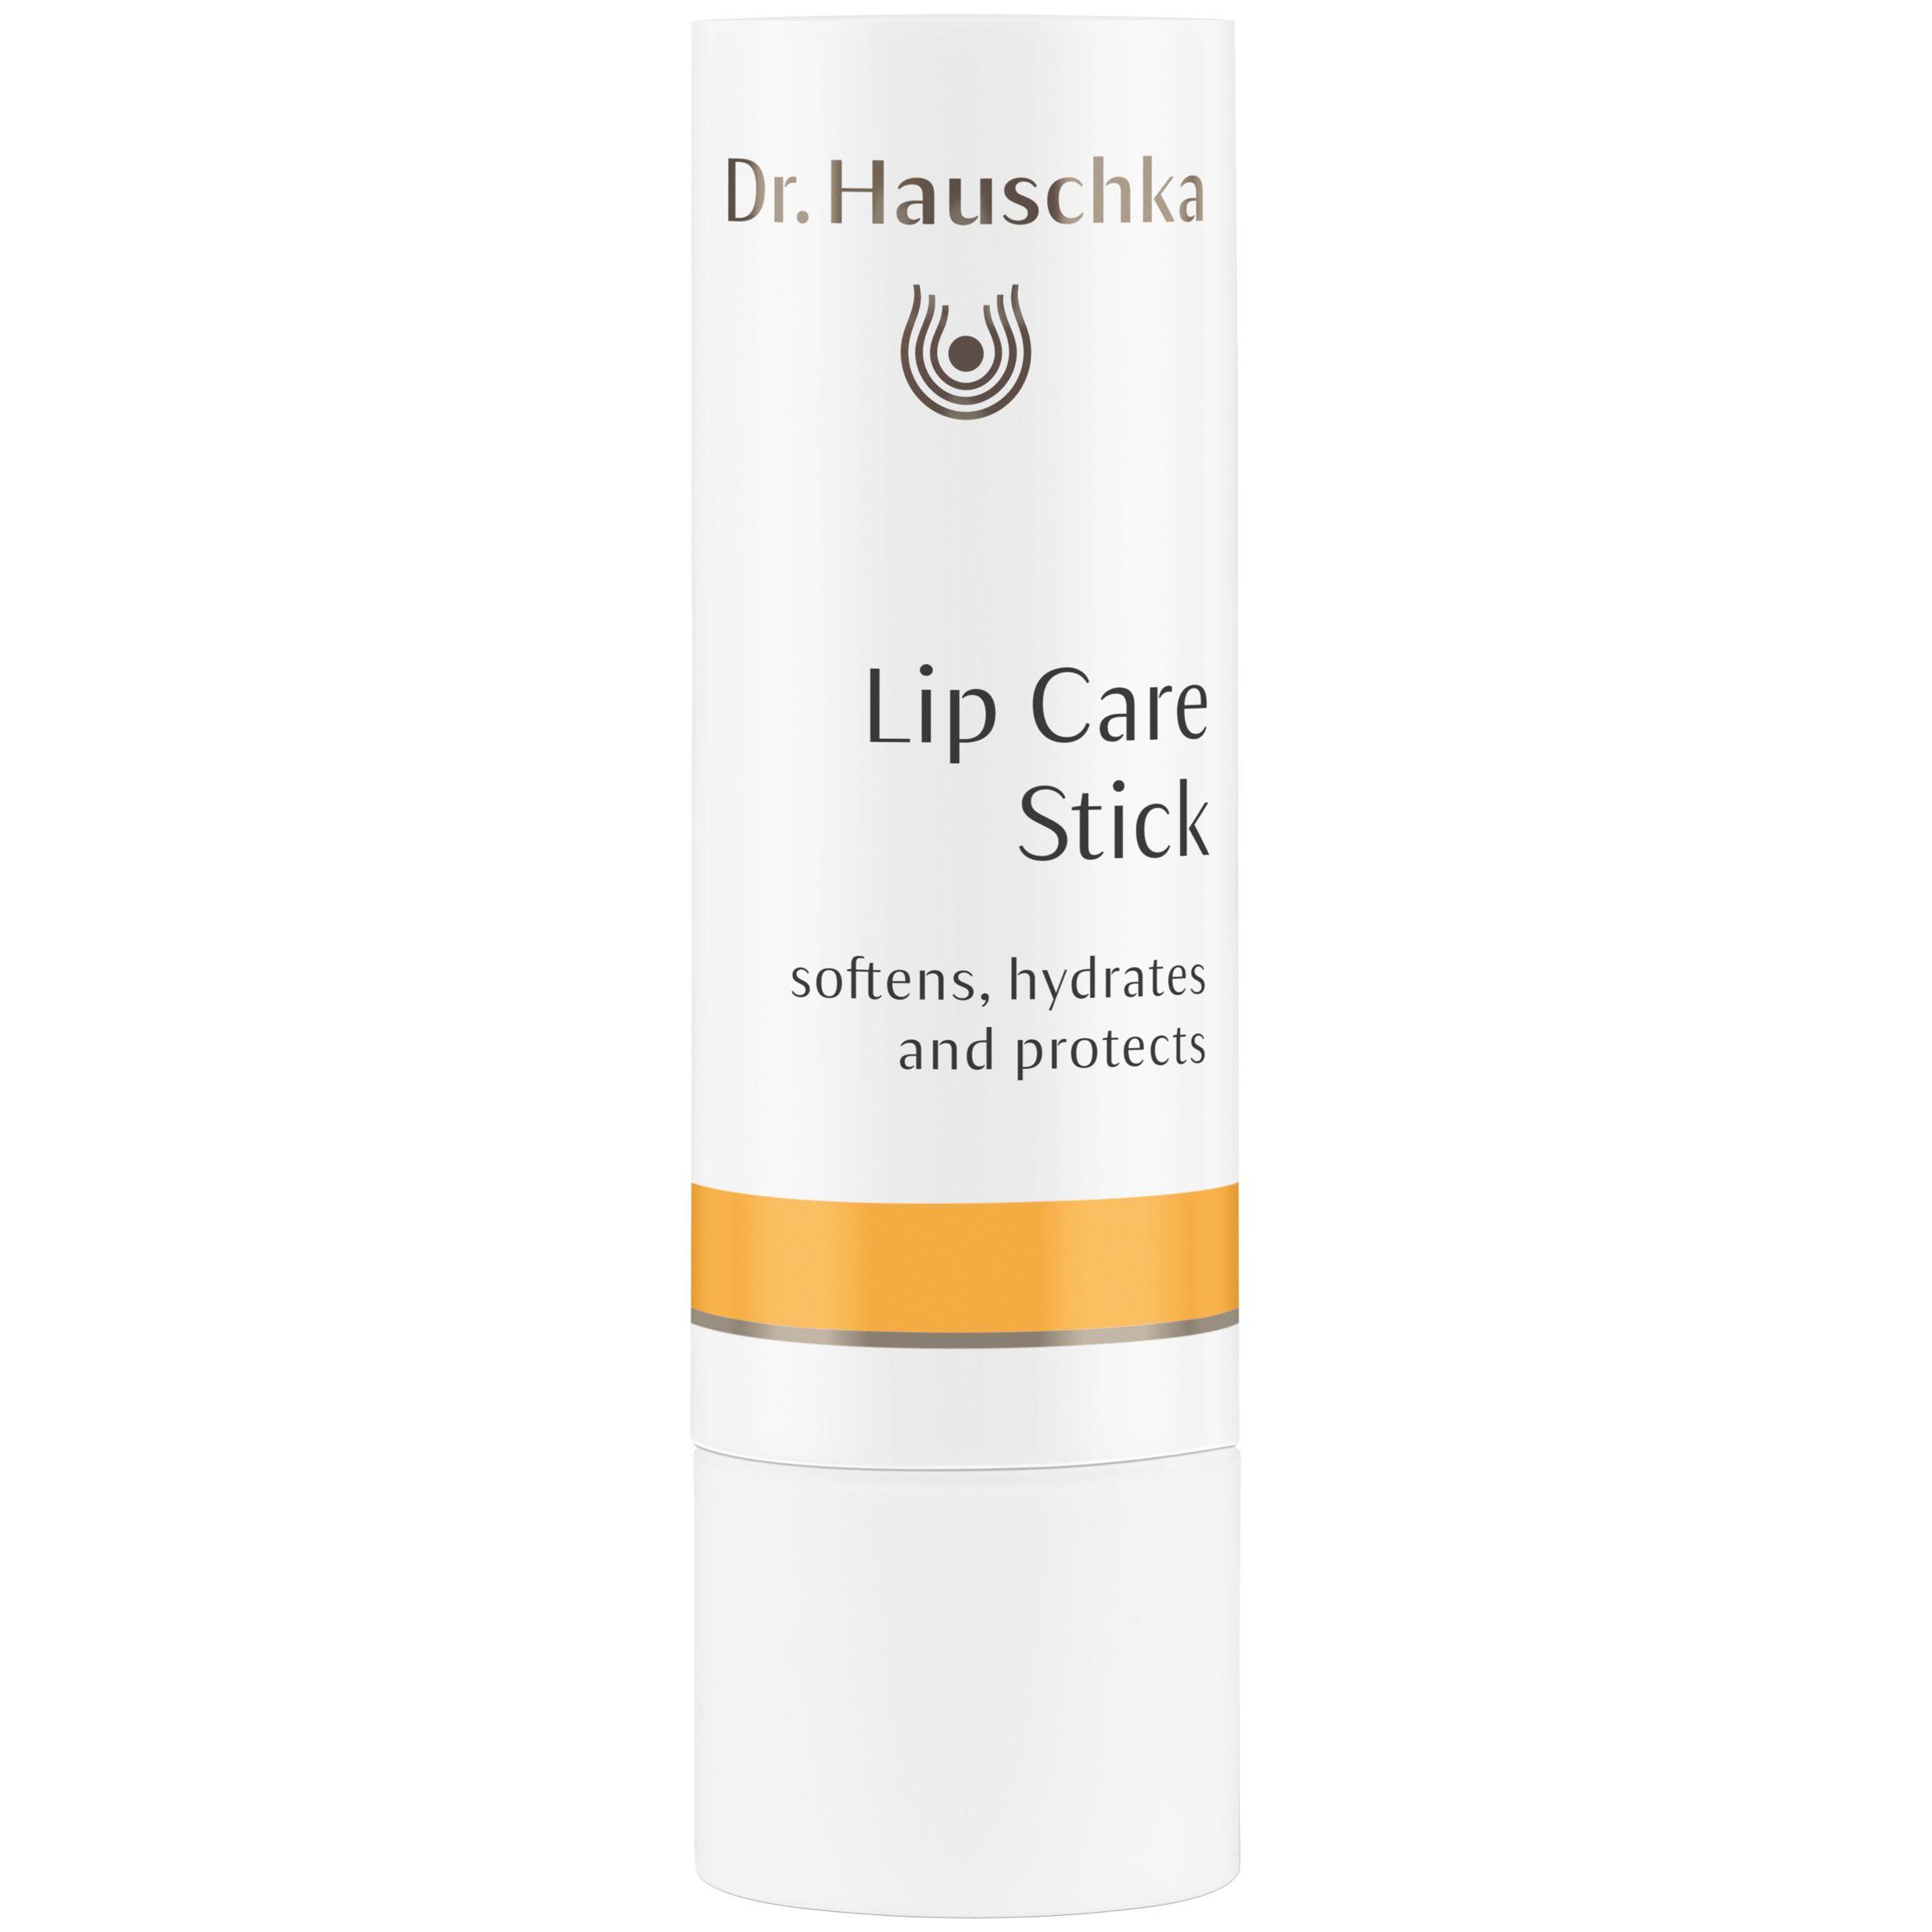 Dr Hauschka Dr Hauschka Lip Care Stick, 4.9g